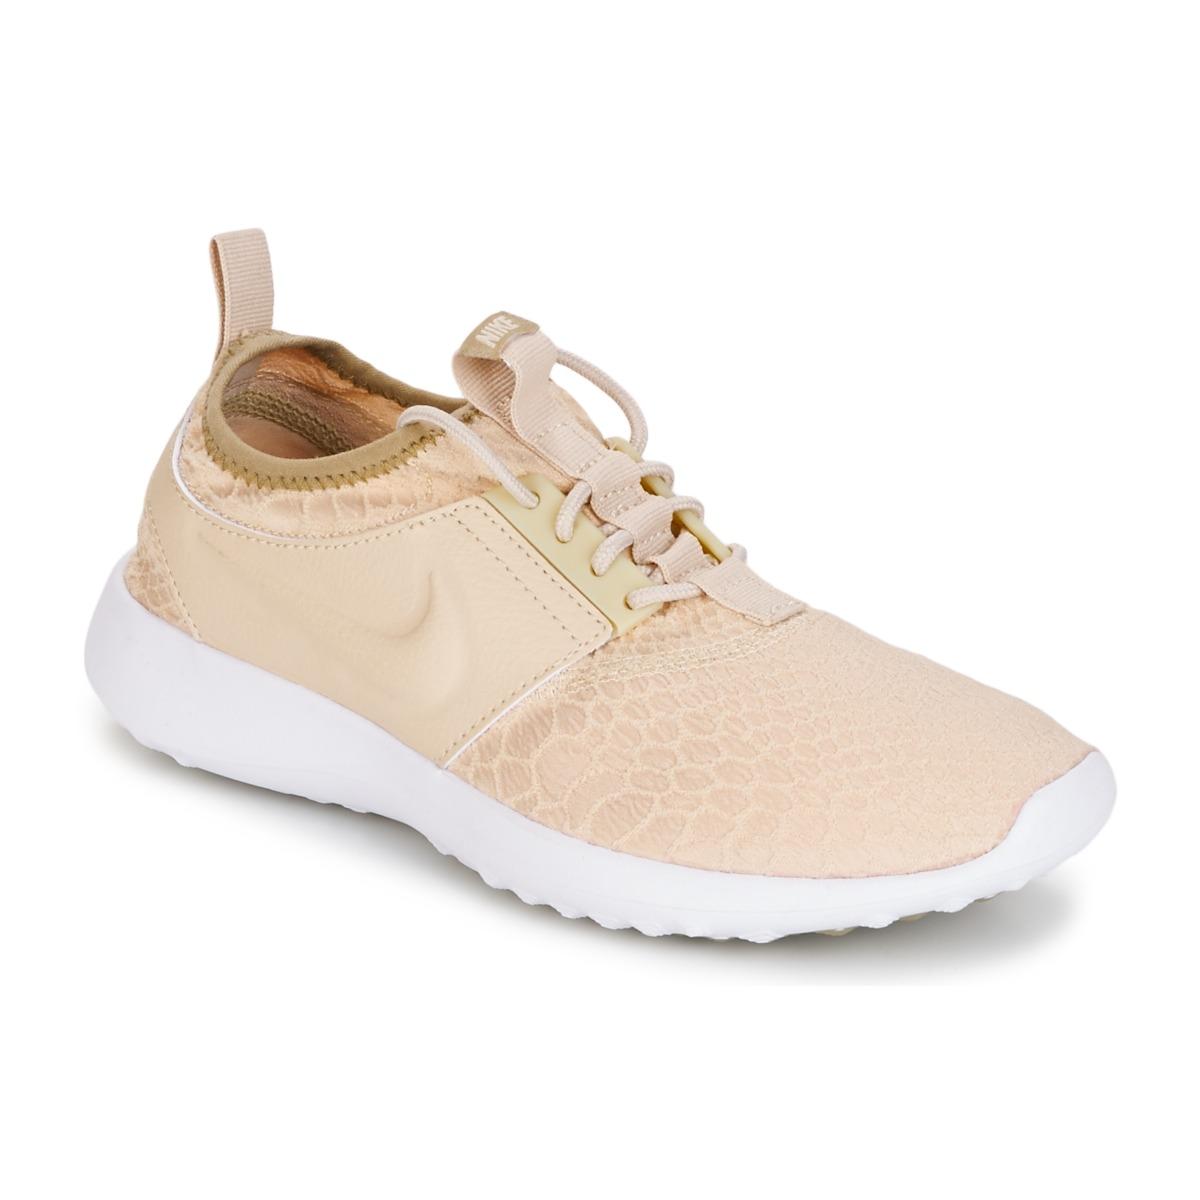 Nike JUVENATE SE W BEIGE Shoes Low top trainers Women low-cost